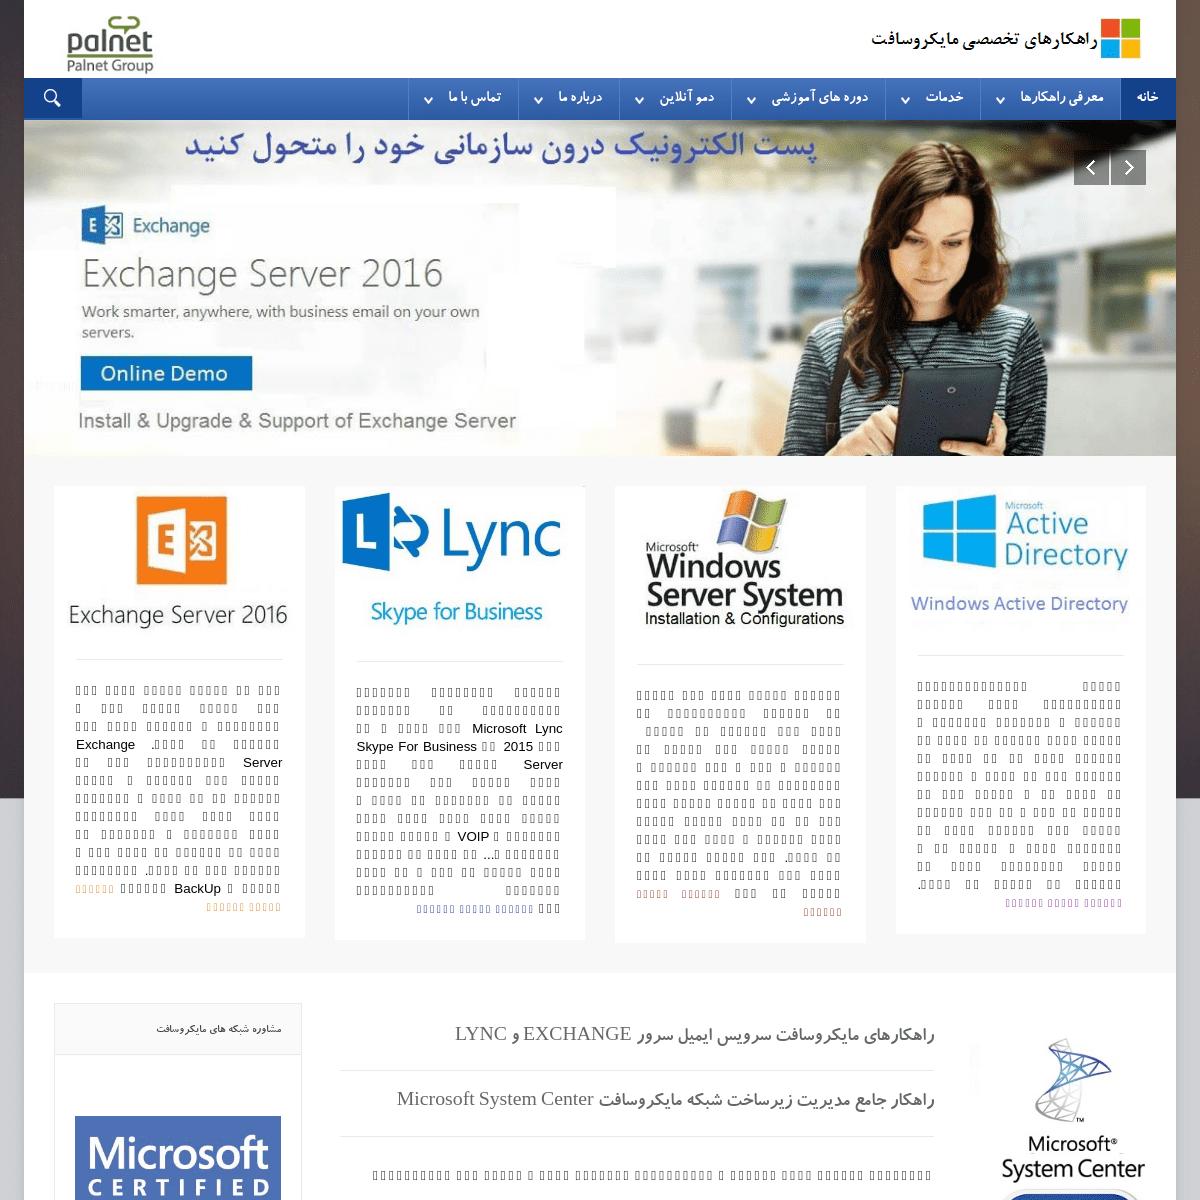 ArchiveBay.com - microsoftservices.ir - راهکارهای مایکروسافت سرویس ایمیل سرور Exchange و Lync - نصب راه اندازی و پشتی